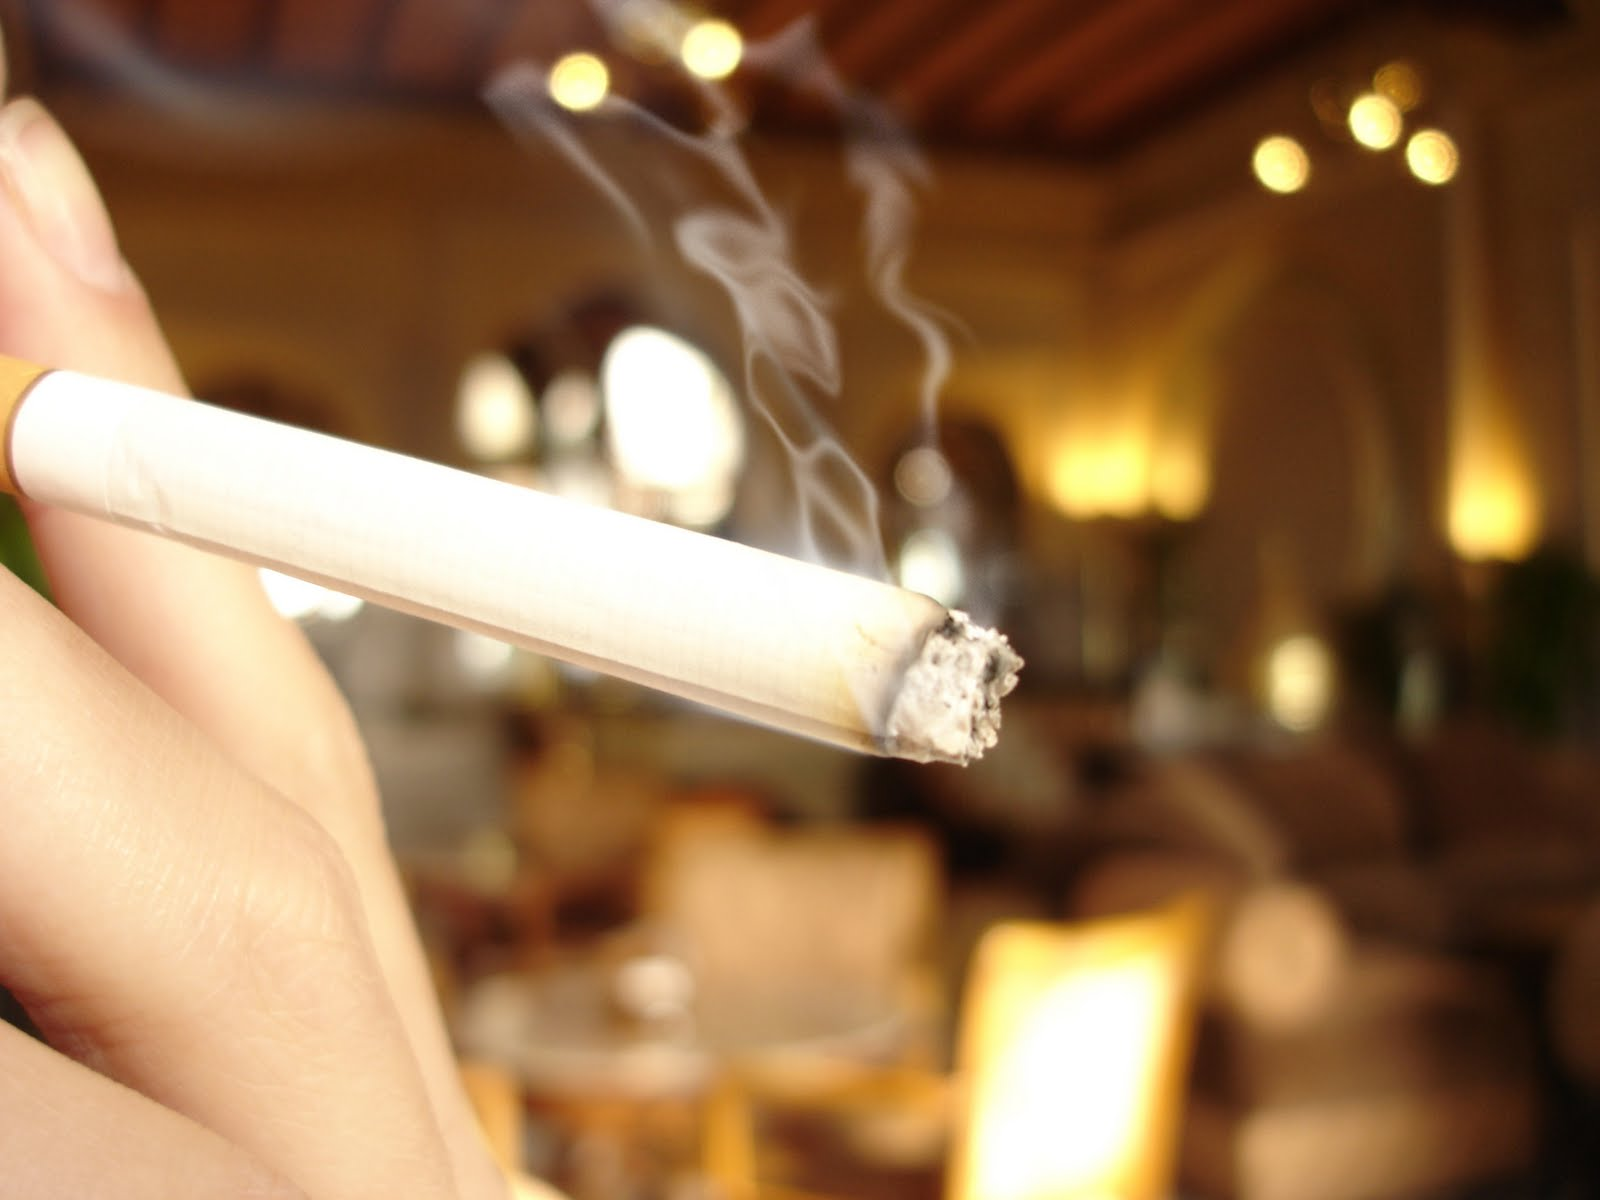 Saúde: Joinville oferece tratamento contra o tabaco em 42 unidades de saúde, confira!